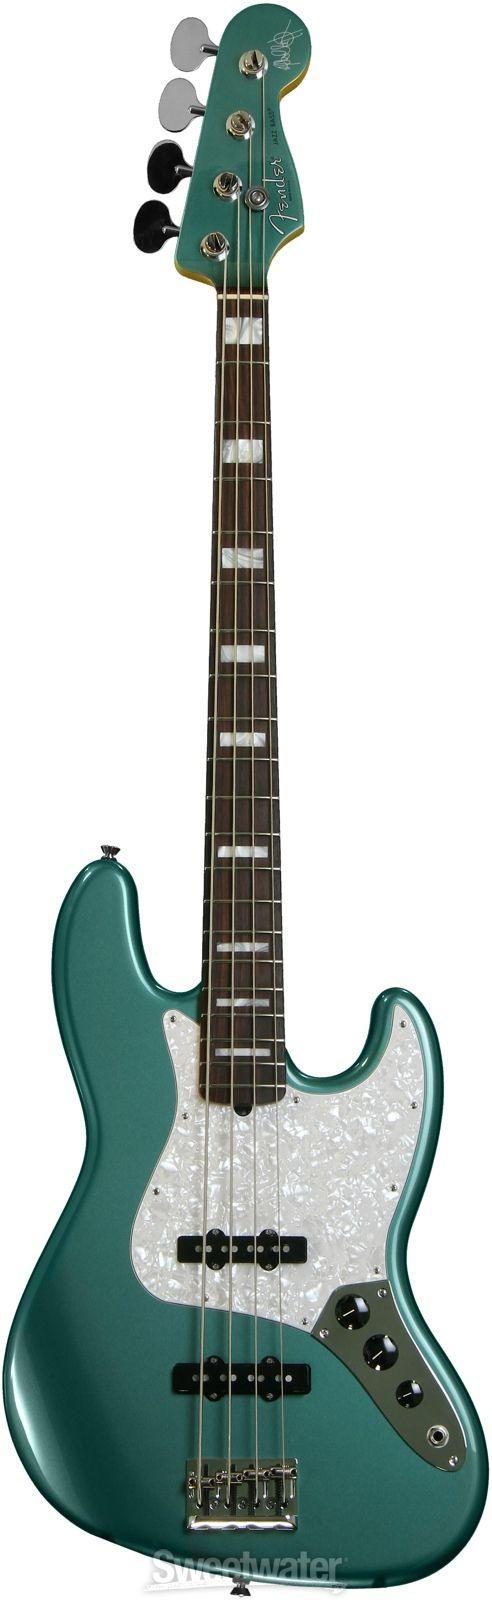 Fender Adam Clayton Jazz Bass - Sherwood Green Metallic | Sweetwater.com